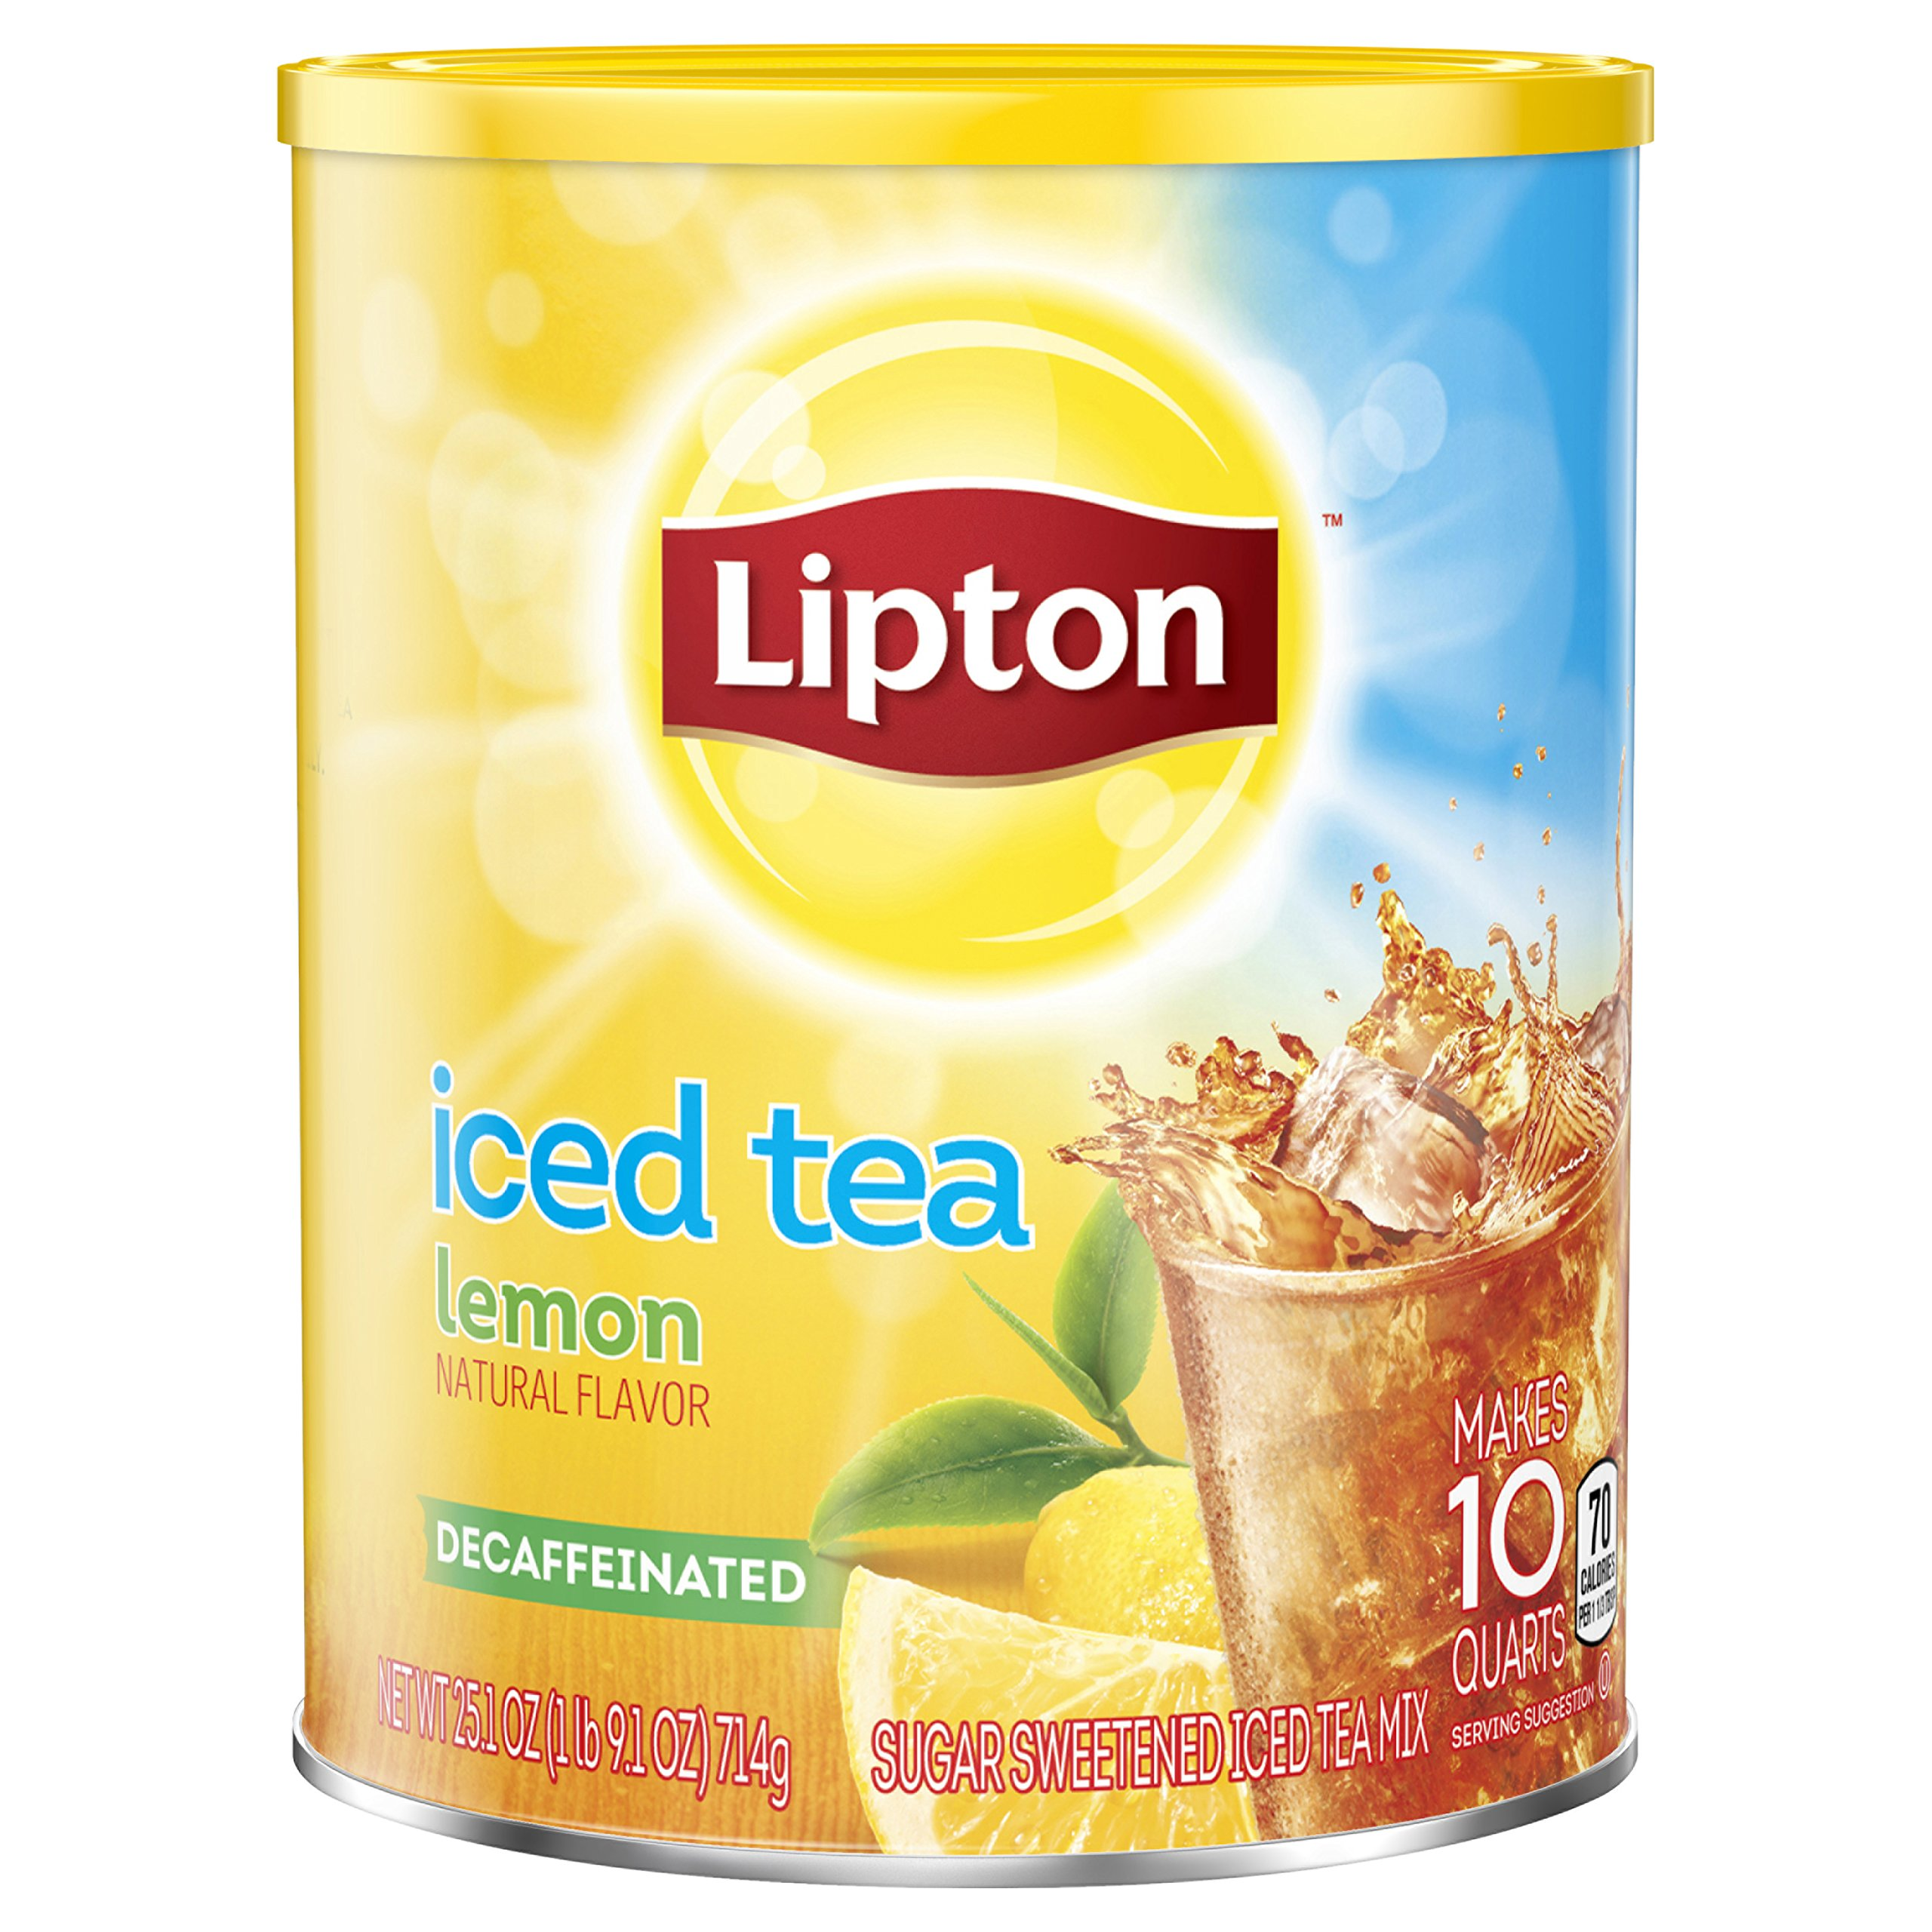 Lipton Black Iced Tea Mix, Decaf Lemon Sweetened, 10 Quart - Pack of 3